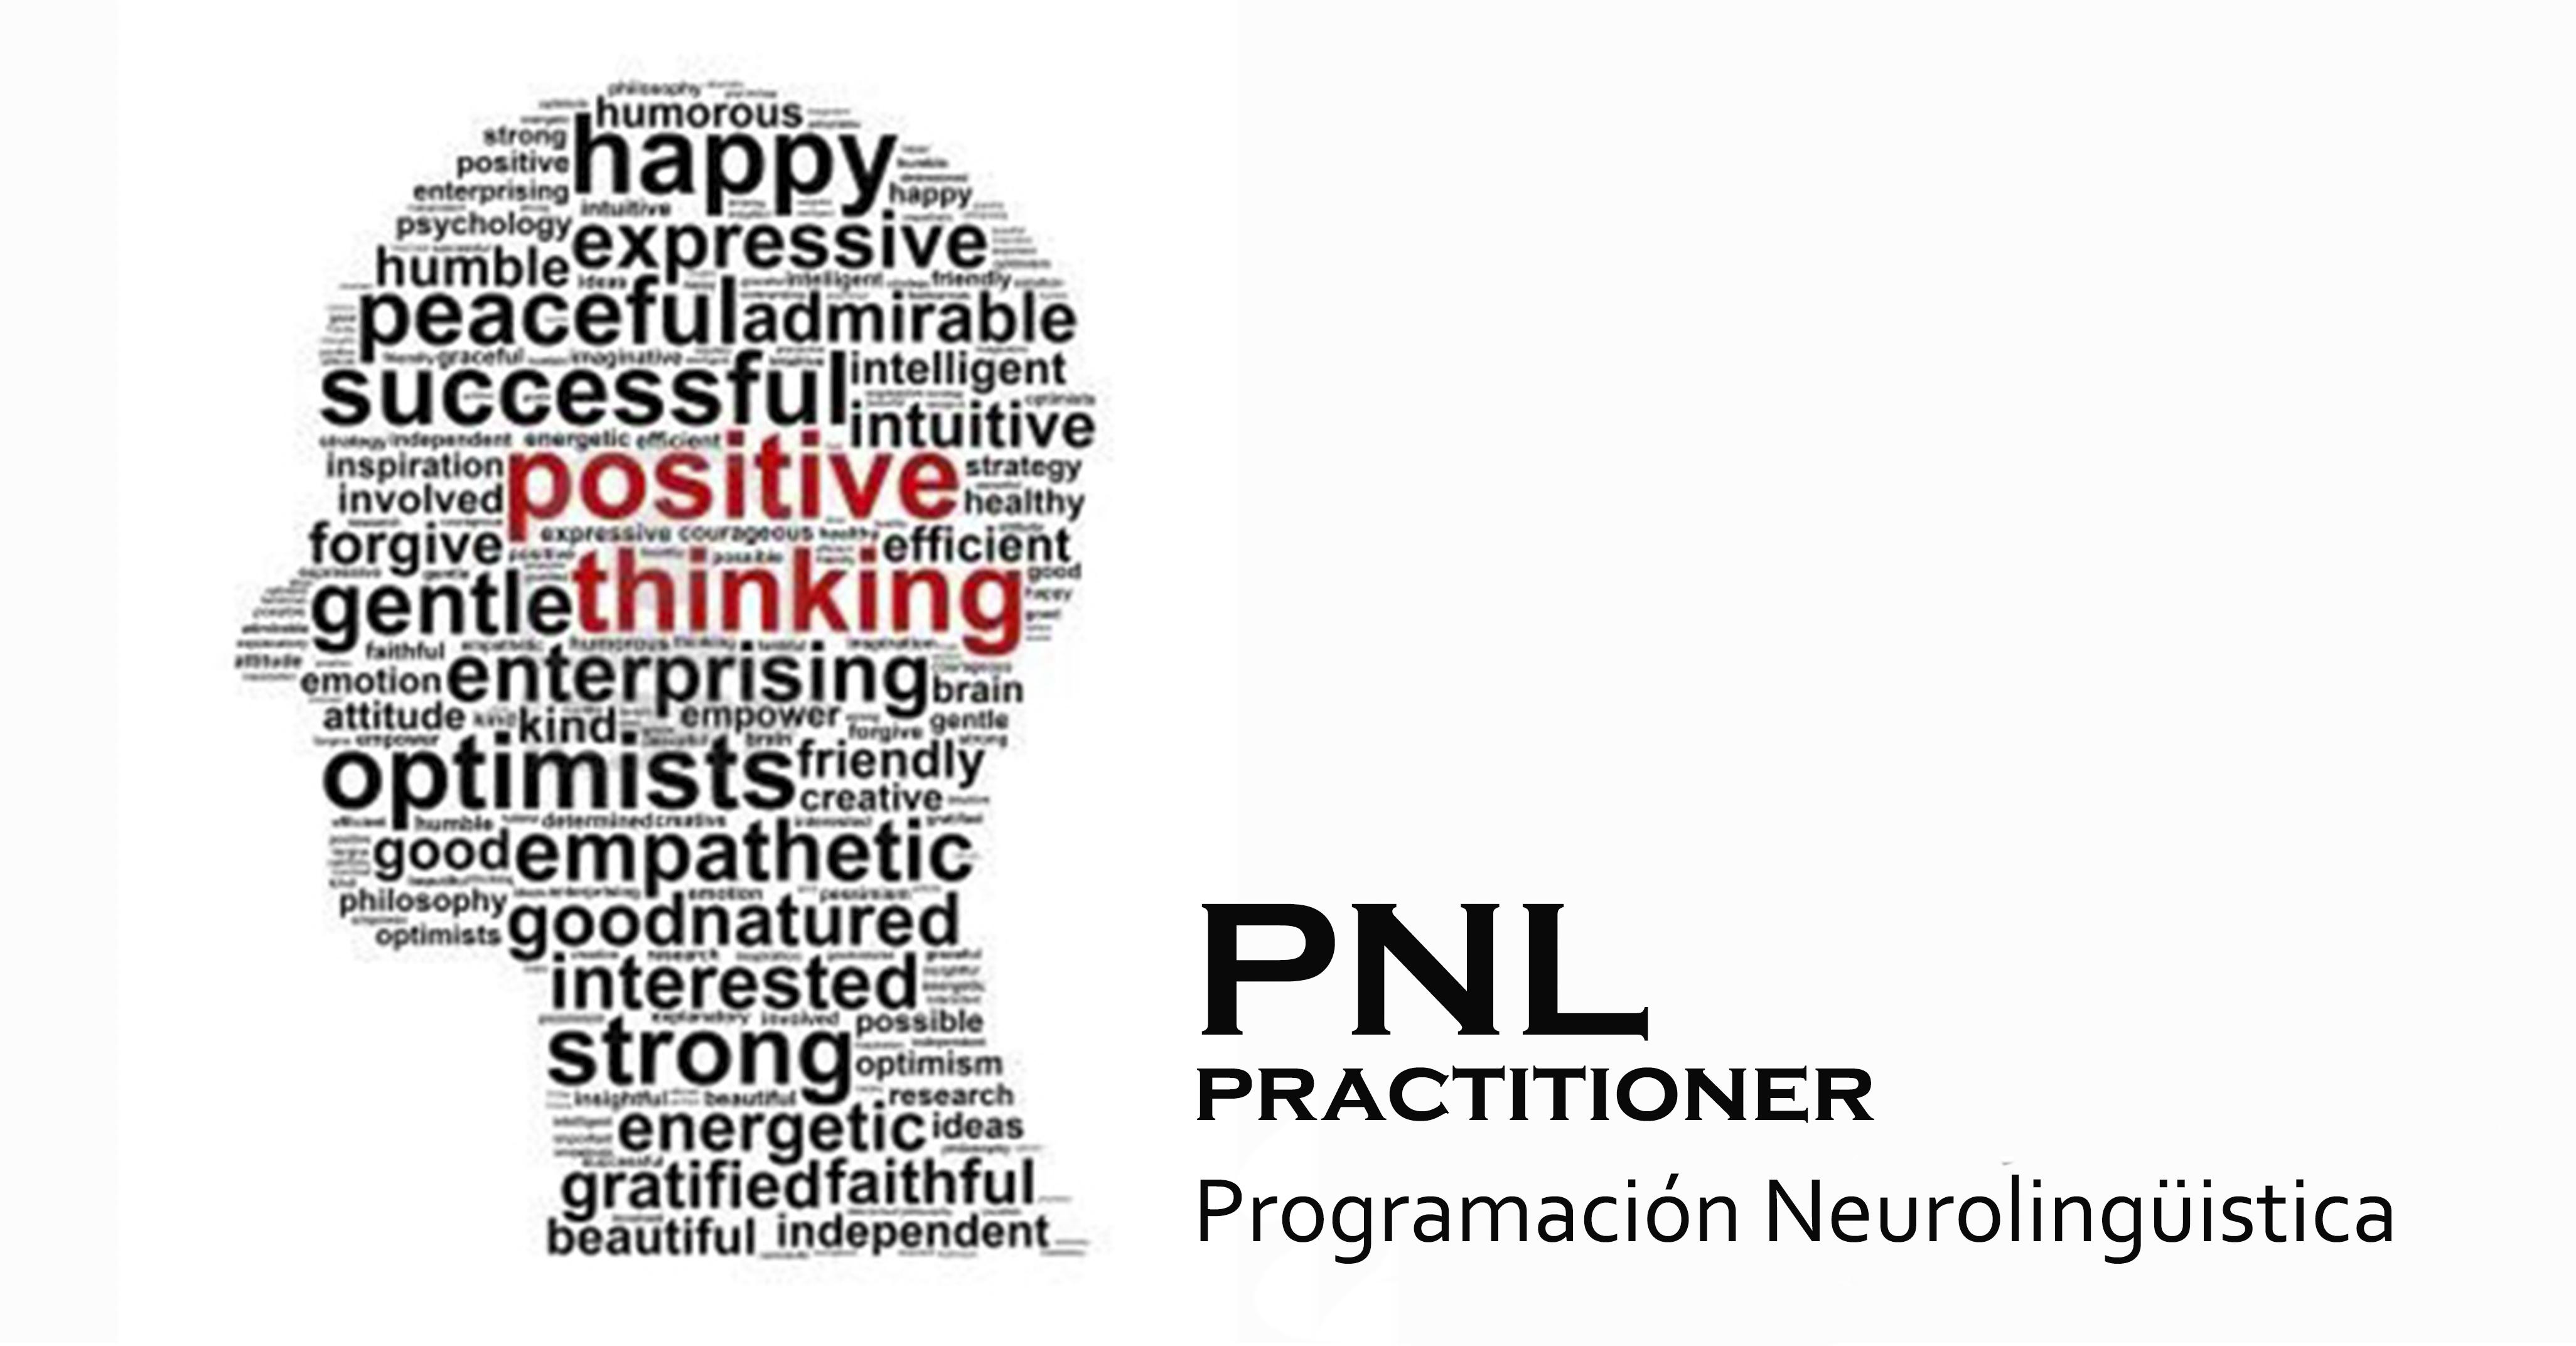 PNL Practitioner1